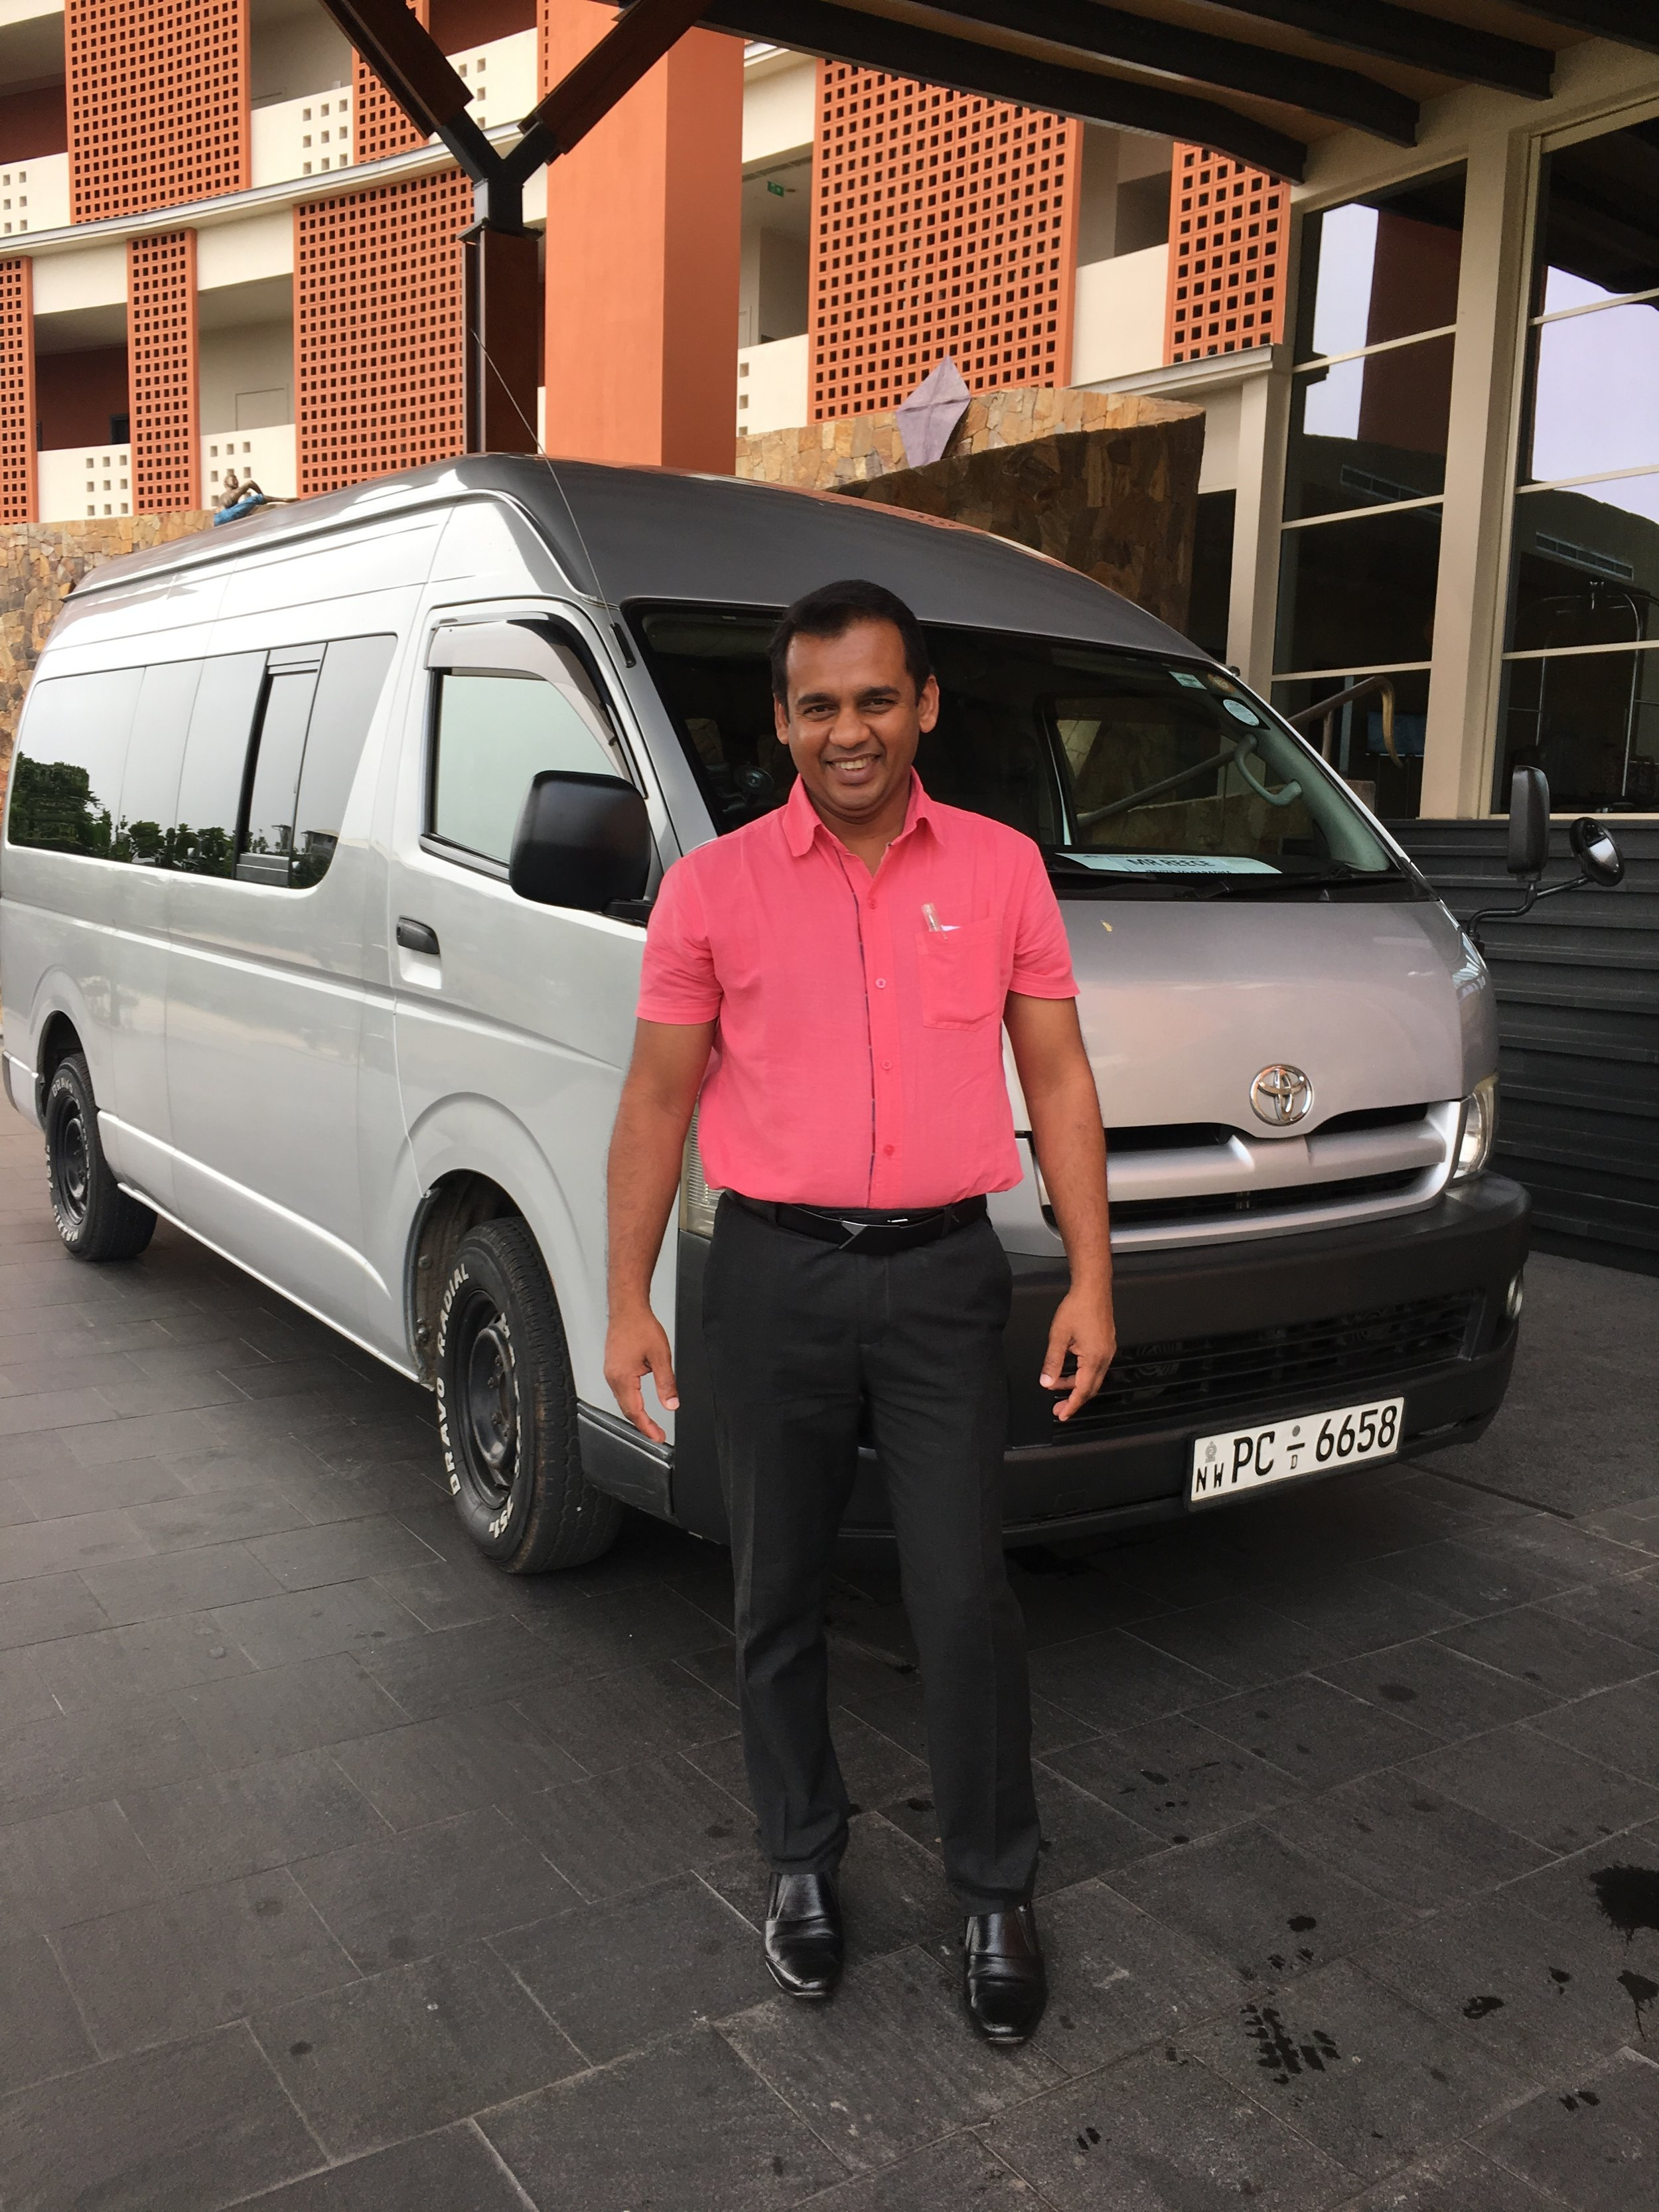 invite-to-paradise-holiday-honeymoon-sri-lanka-maldives-chauffeur-guide-1.jpg